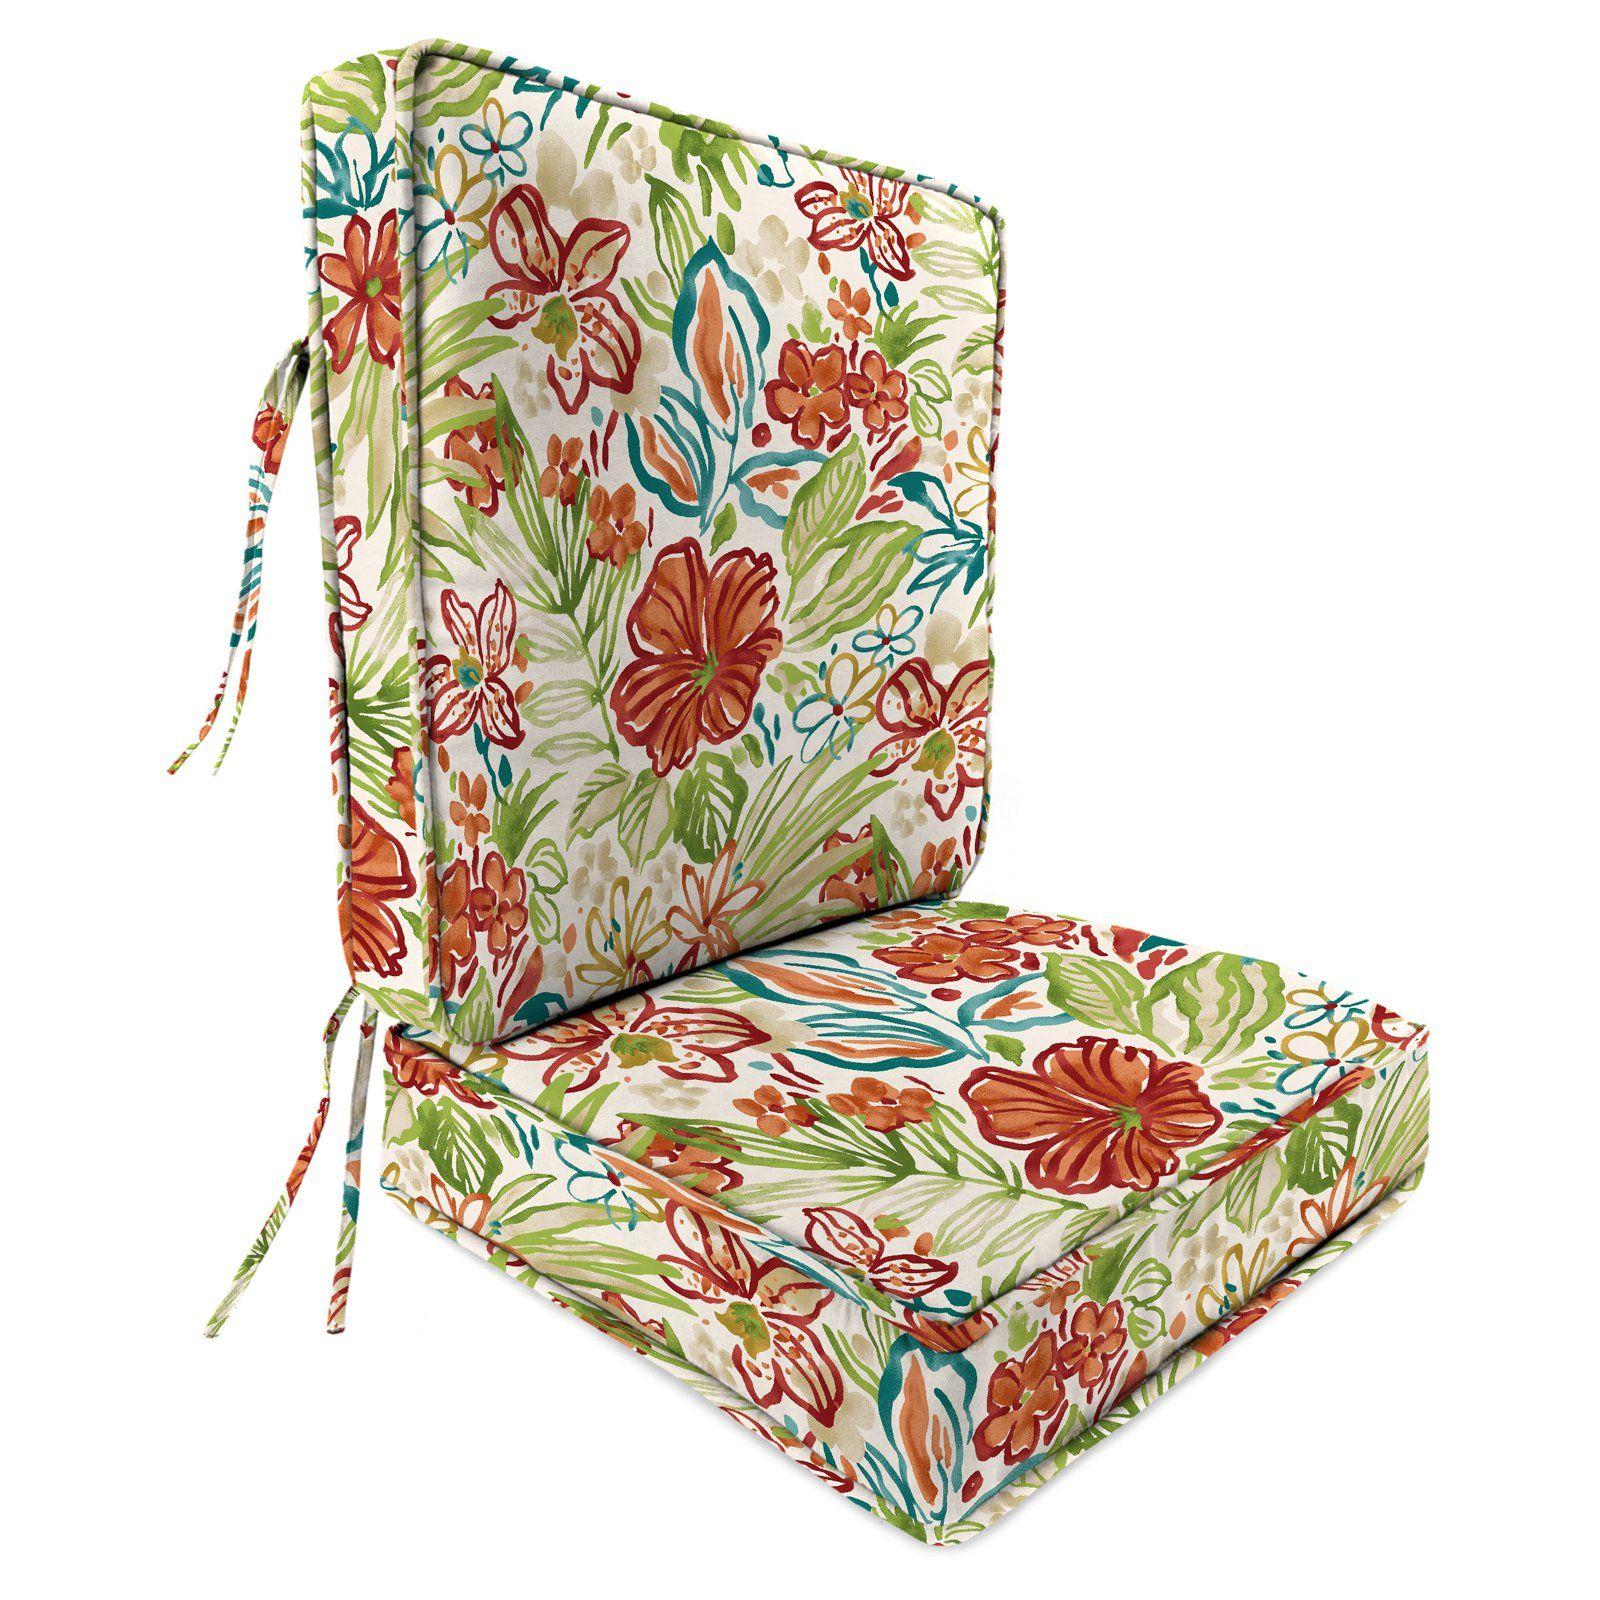 Jordan Manufacturing 22 5 In 2 Piece Deep Seat Outdoor Valeda Chair Cushion In 2021 Chair Cushions Jordan Manufacturing Outdoor Chair Cushions